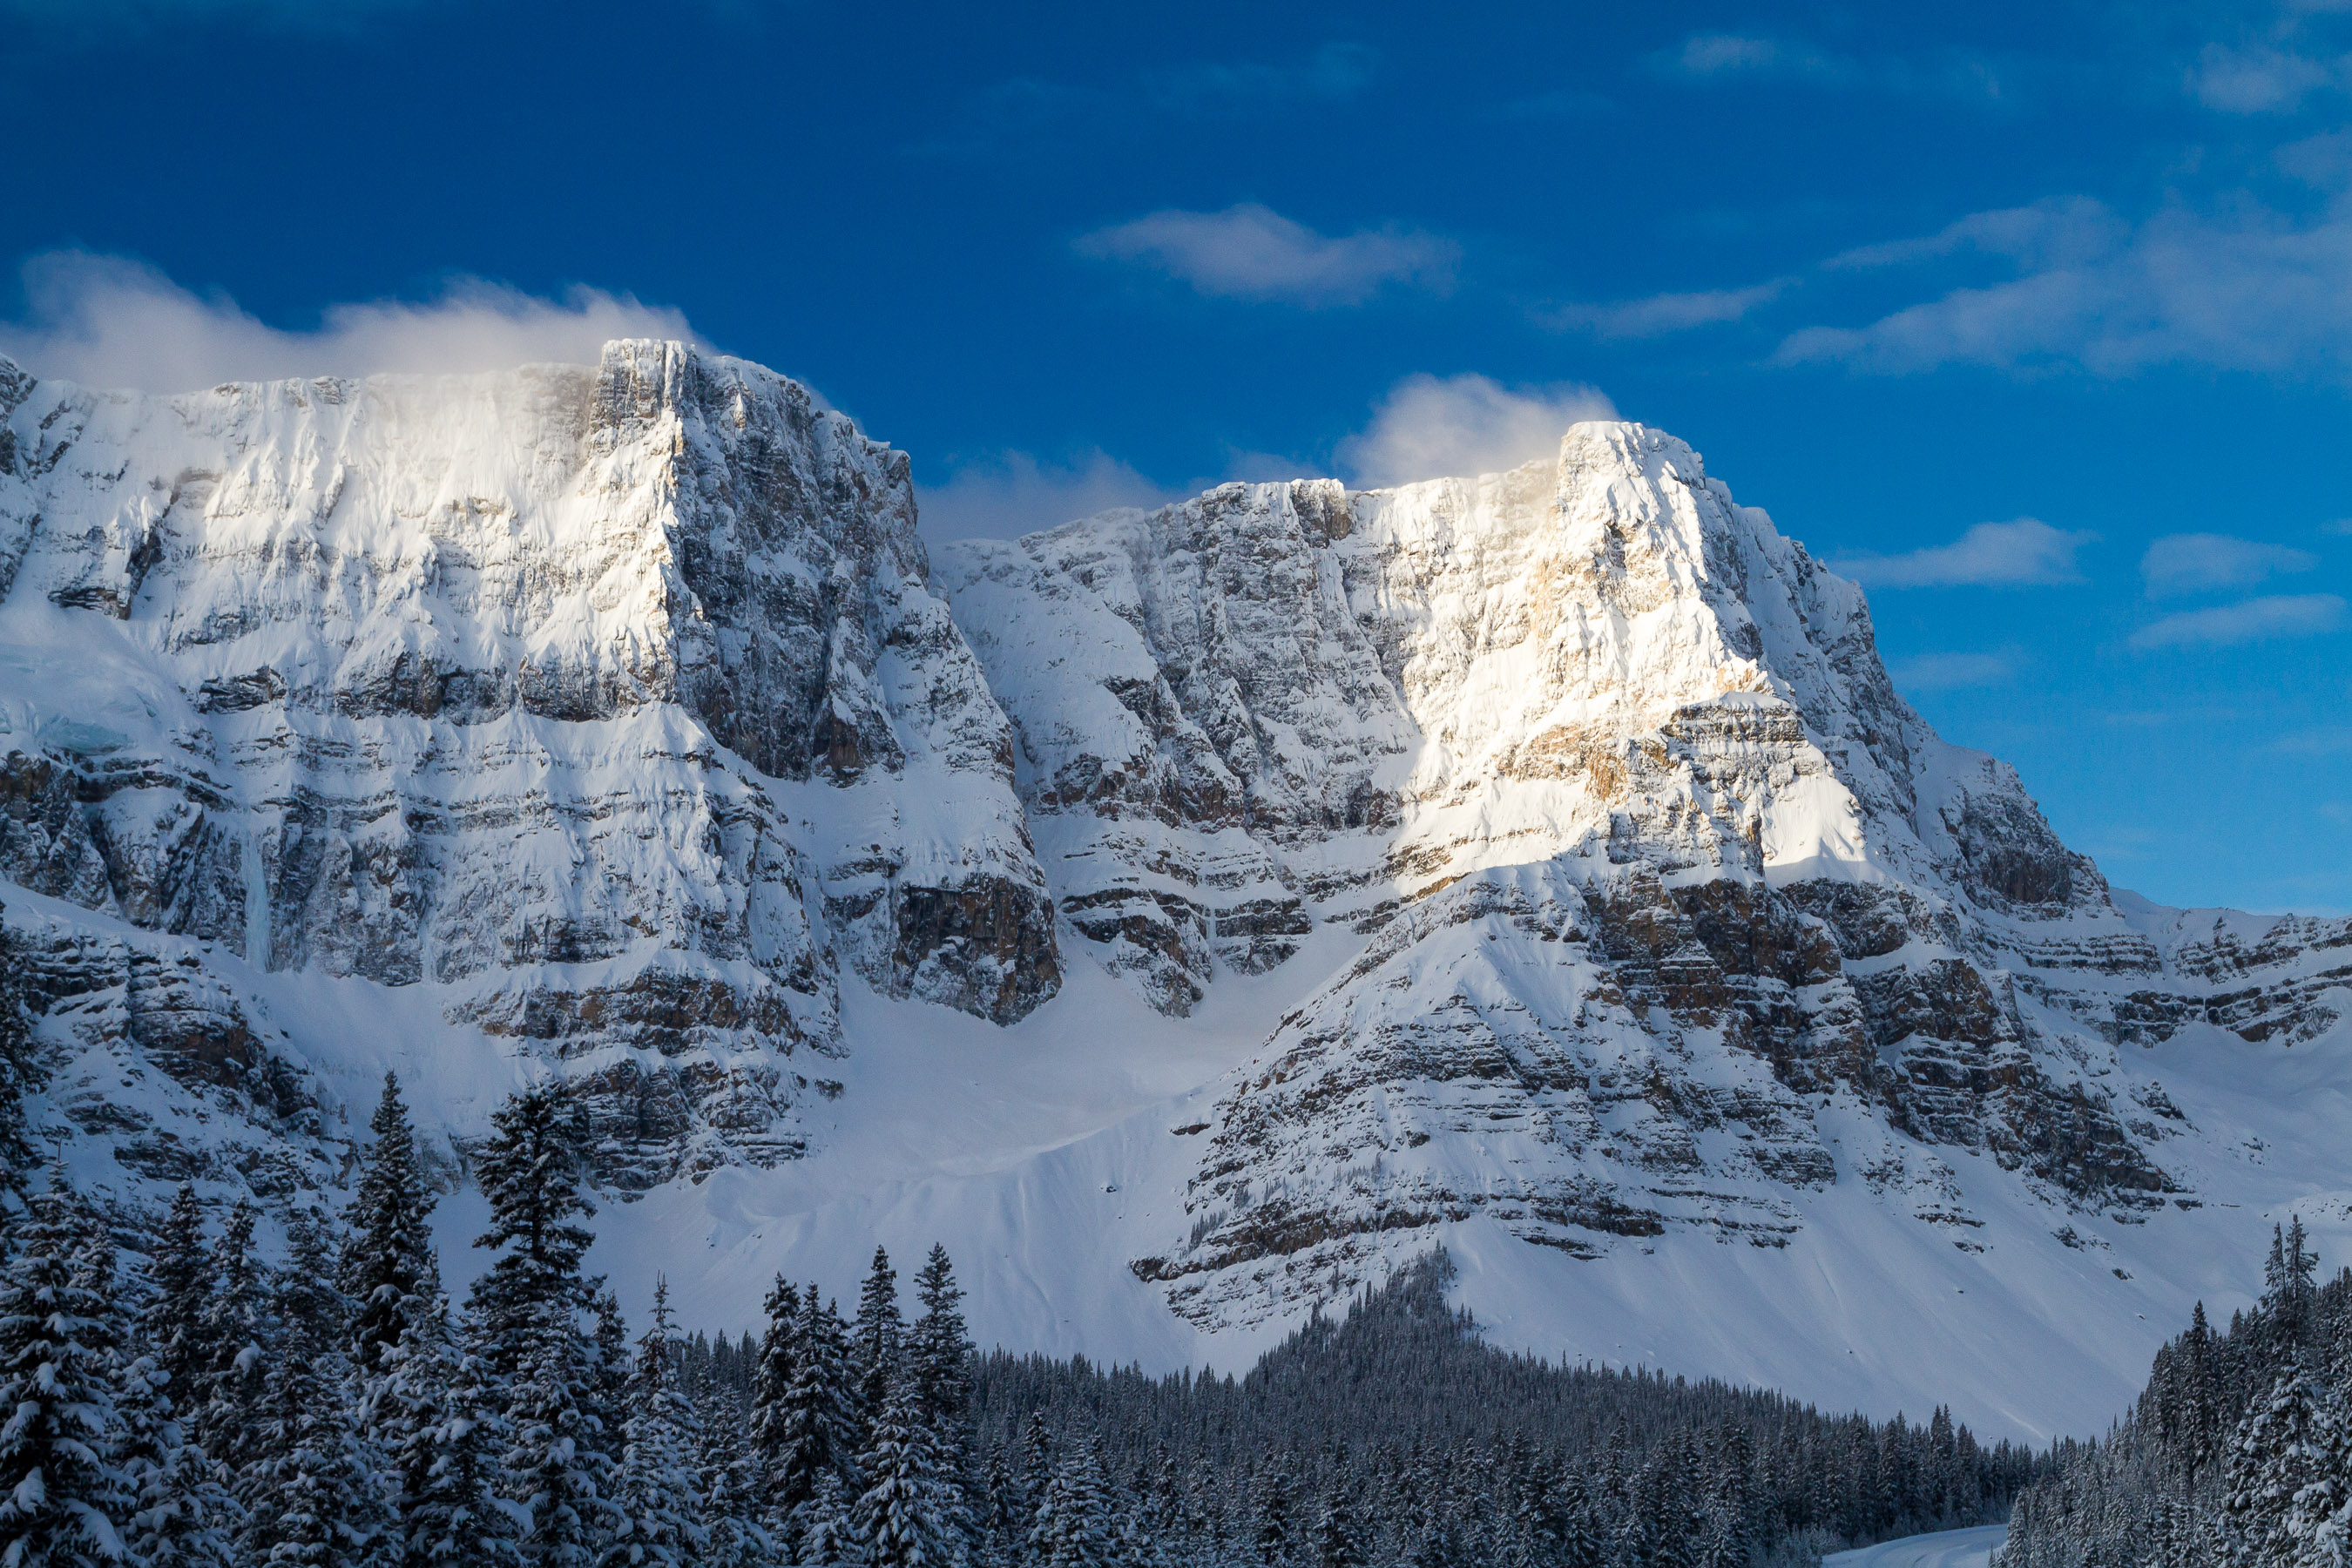 Business, Canada, Company, Corporation, SmugMug, banff, feature, lake louise, mountain, rockies